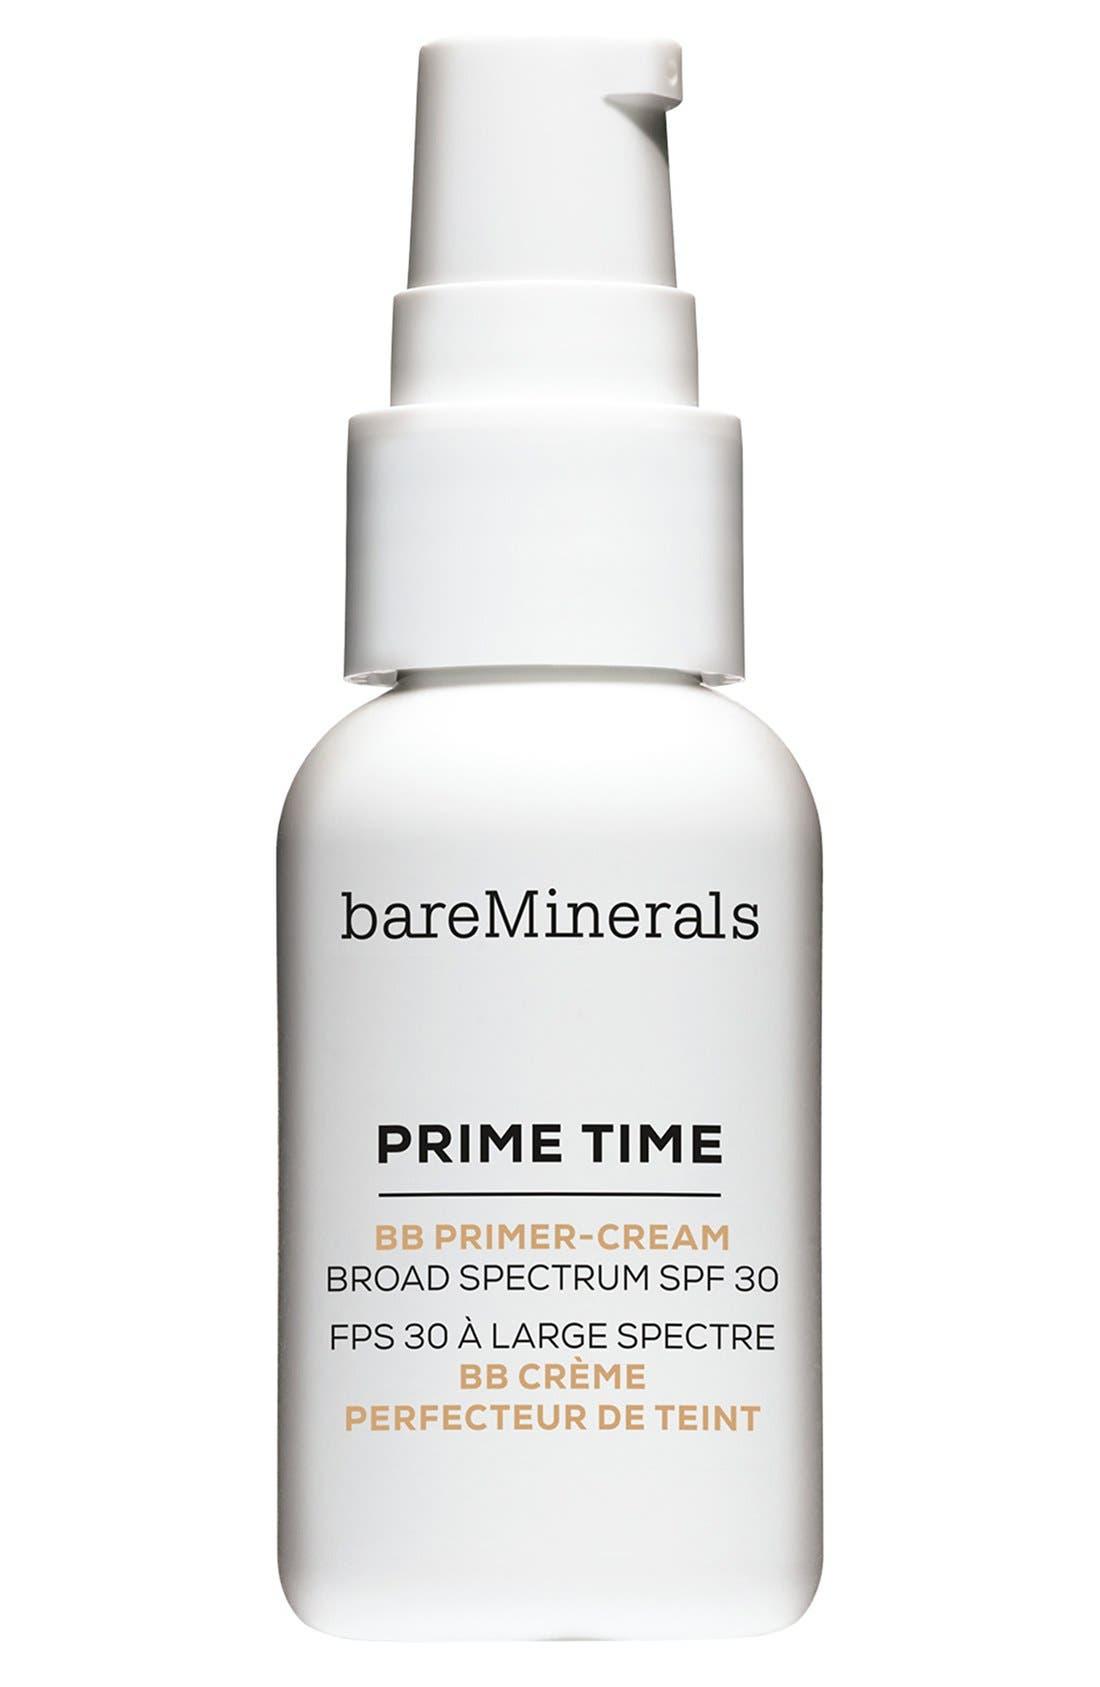 bareMinerals® Prime Time BB Primer-Cream Broad Spectrum SPF 30